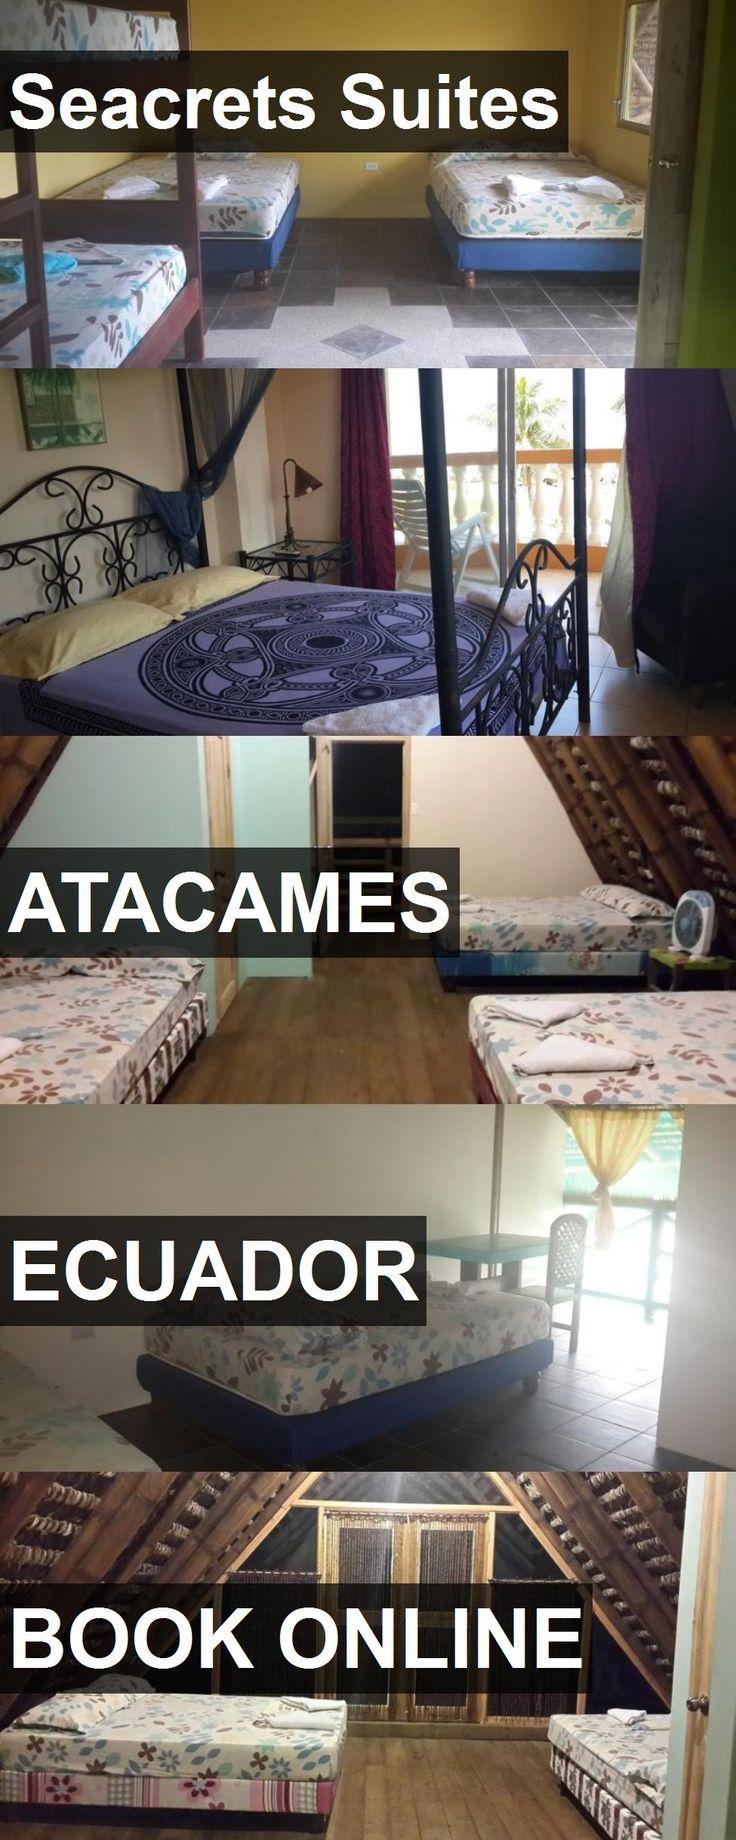 Hotel Seacrets Suites in Atacames, Ecuador. For more information, photos, reviews and best prices please follow the link. #Ecuador #Atacames #travel #vacation #hotel